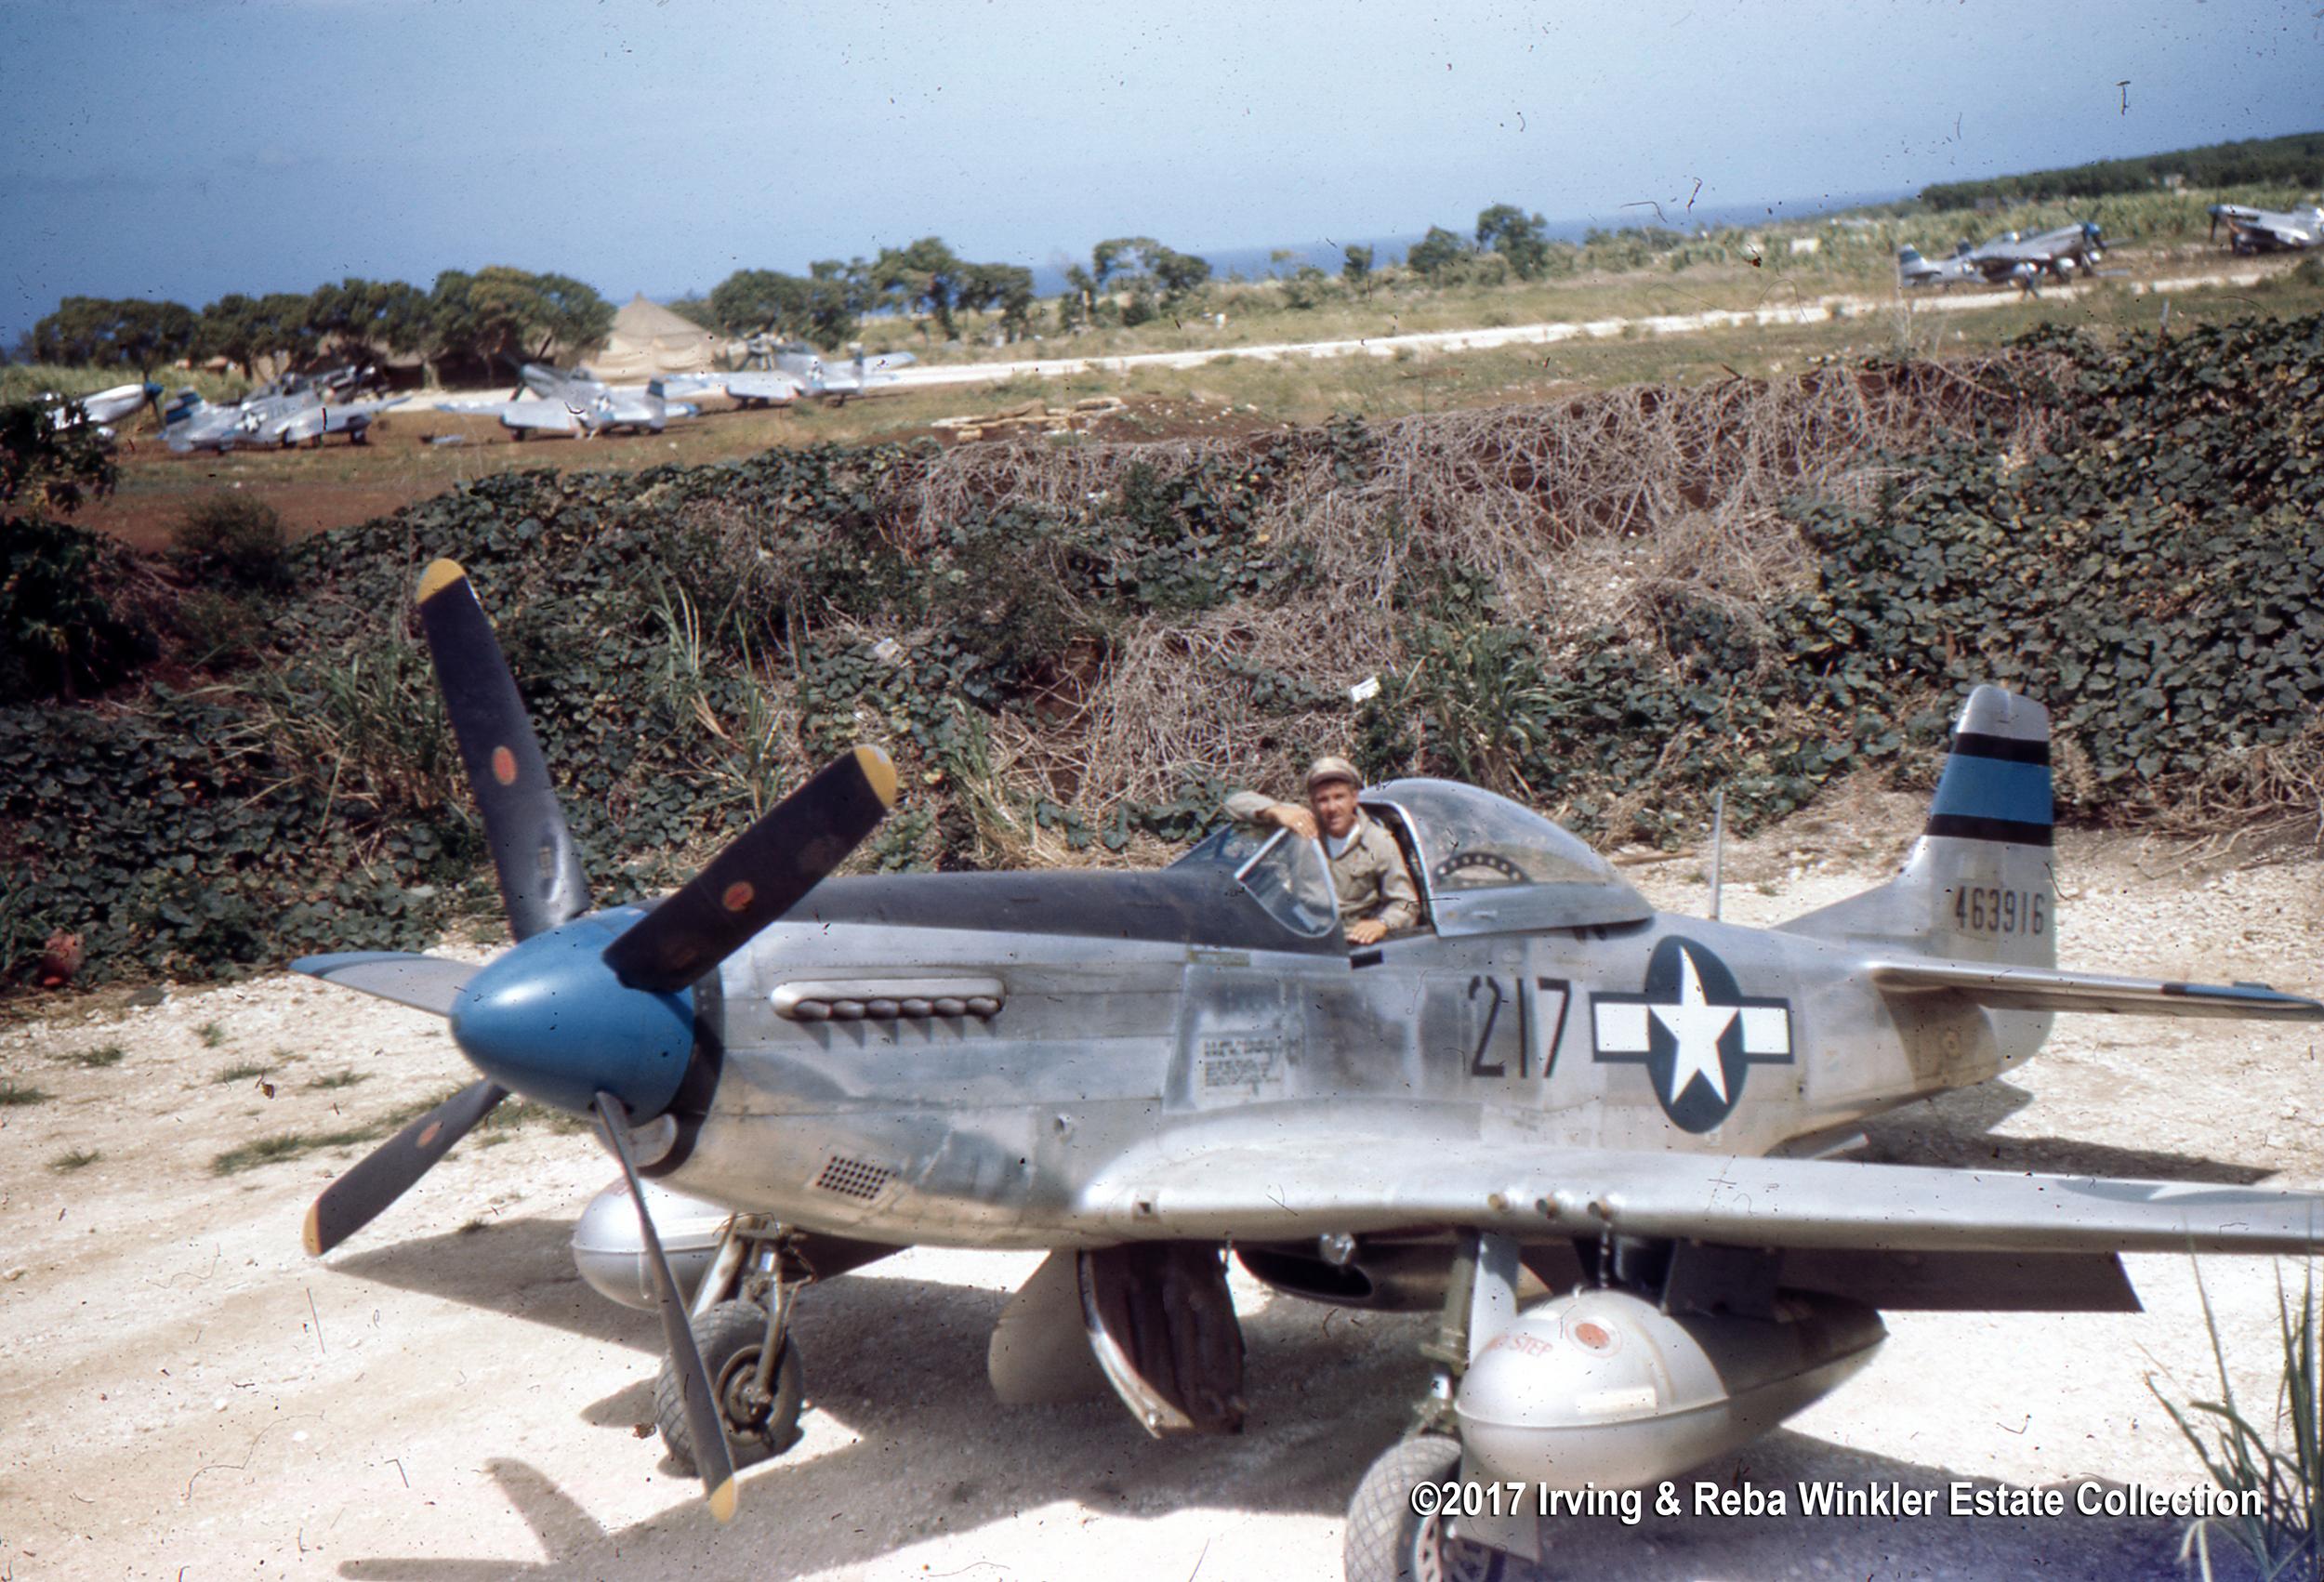 Historic photos film World War II Pacific Theater |